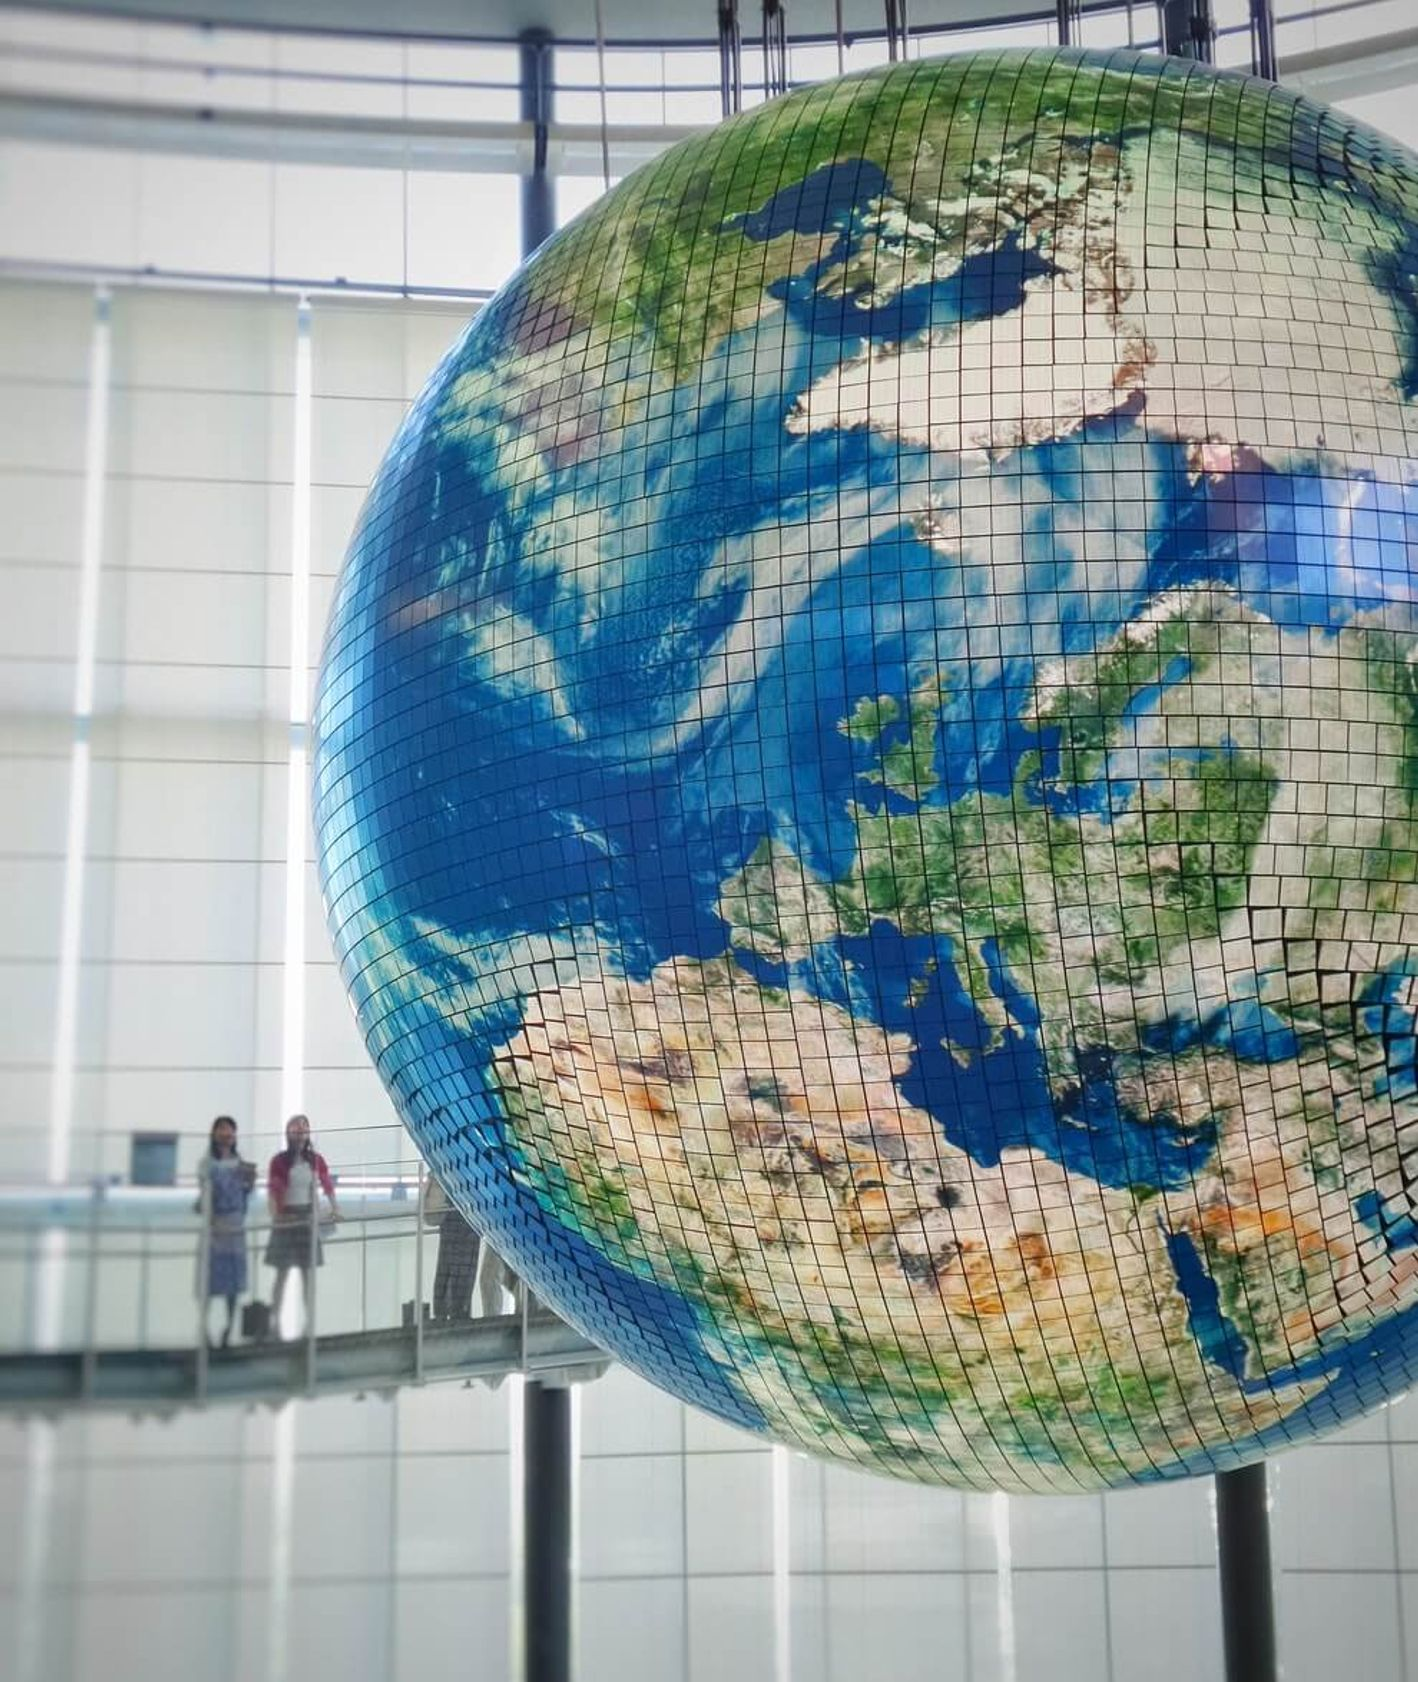 makieta globu jako symbol matki ziemi